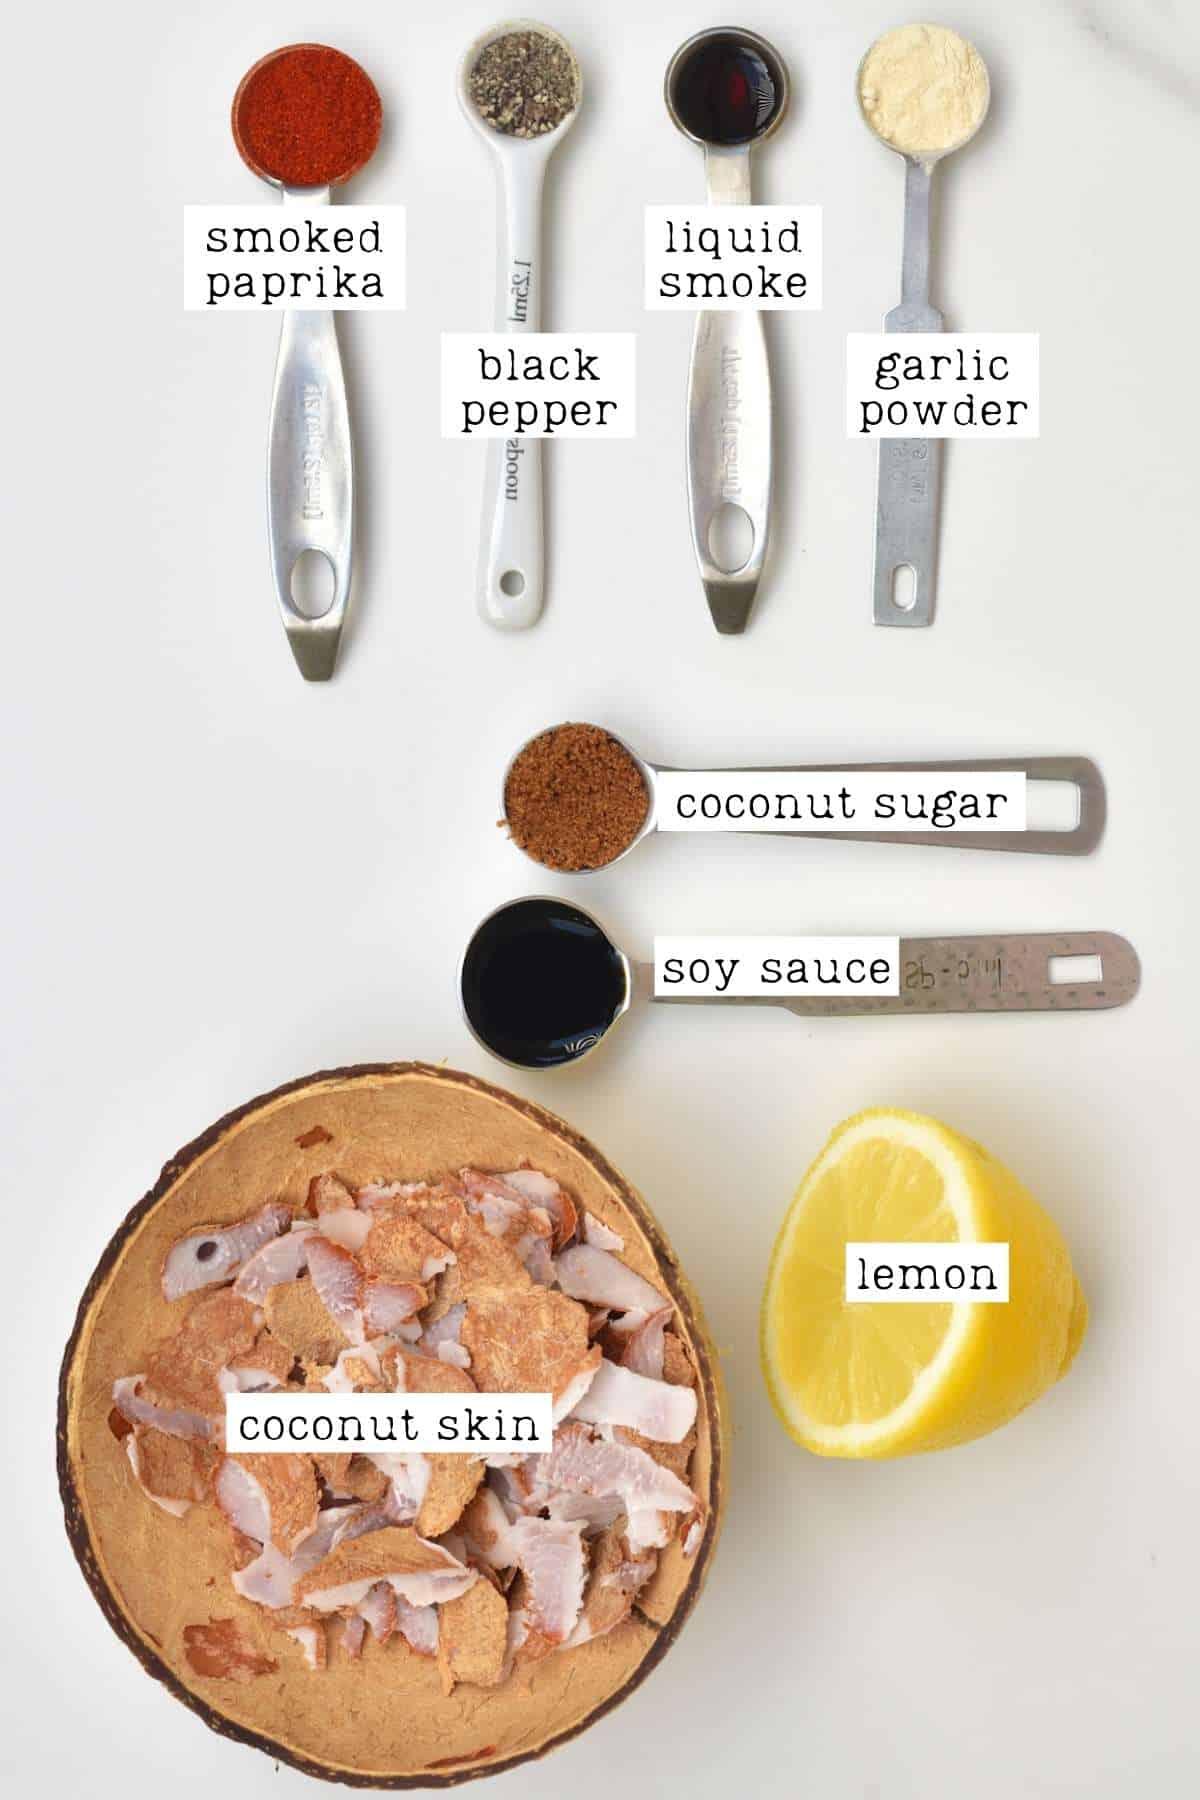 Ingredients for vegan coconut bacon